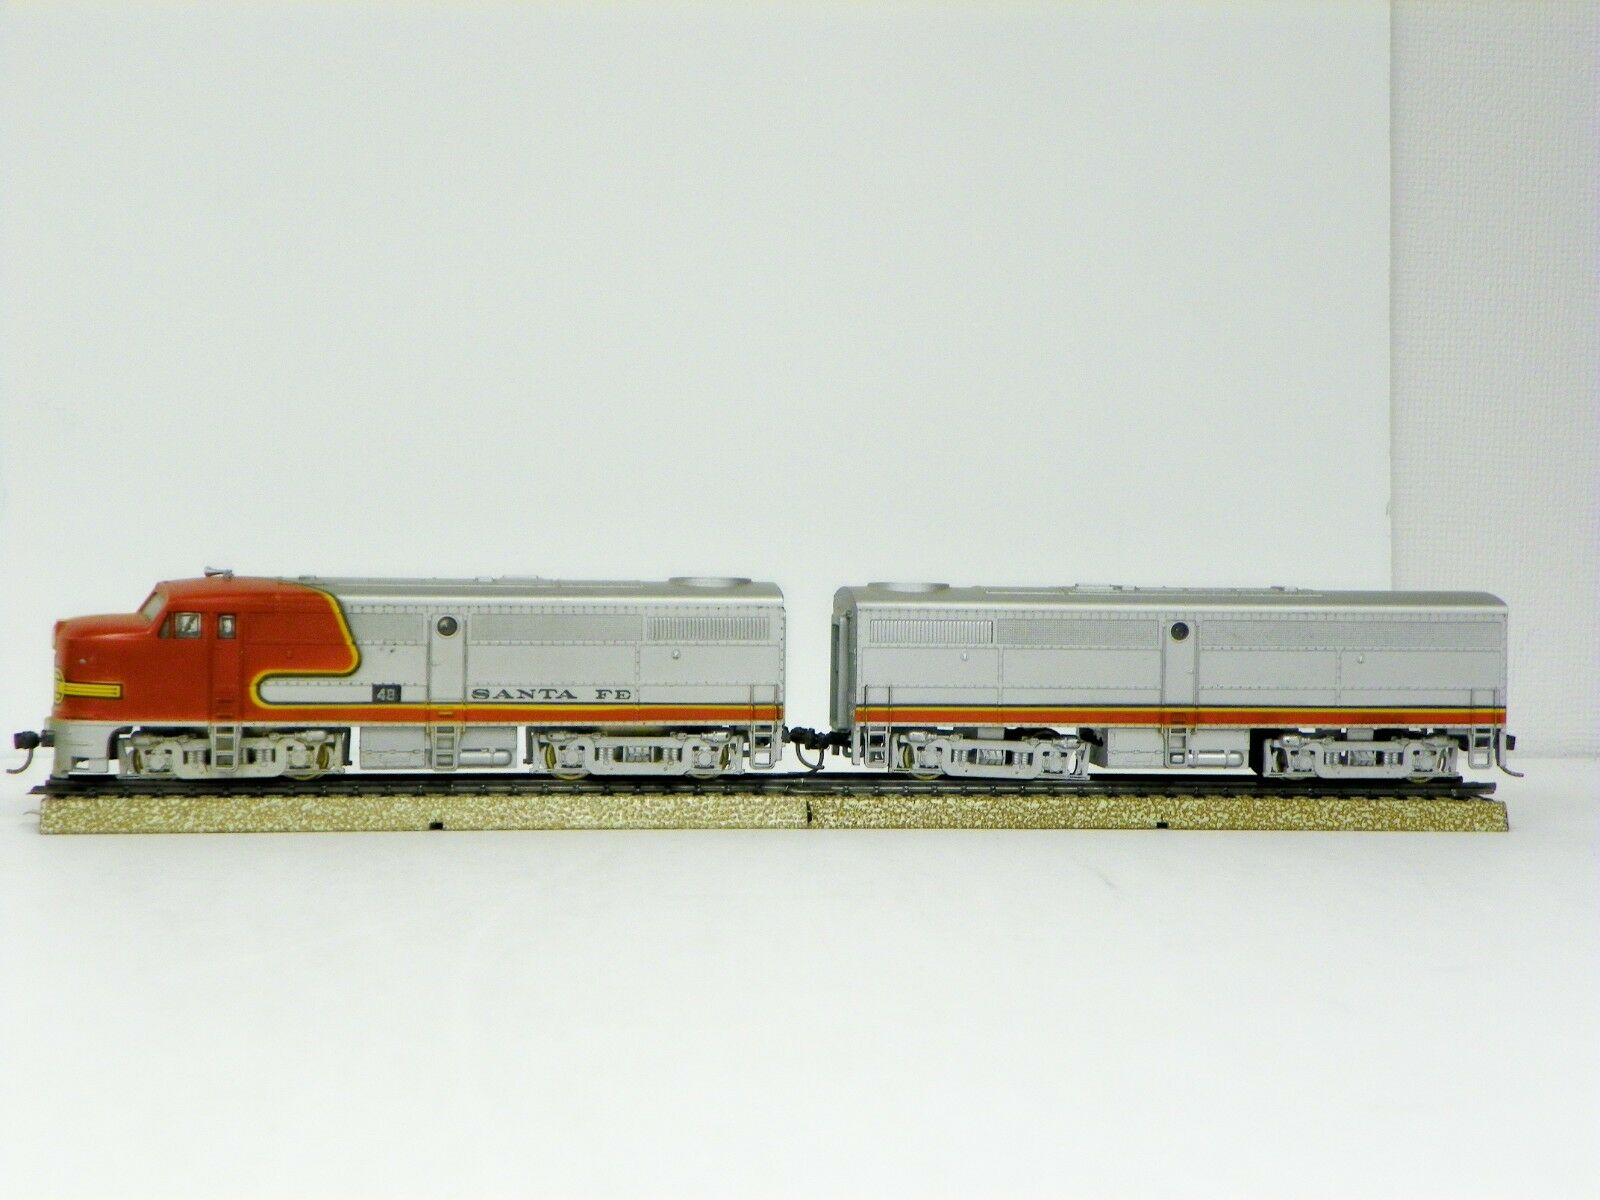 TRAIN MINIATURE HO R-T-R  SANTA FE  FA-1(PWR) FB-1(DMY) ALCO LOCOMOTIVE PAIR